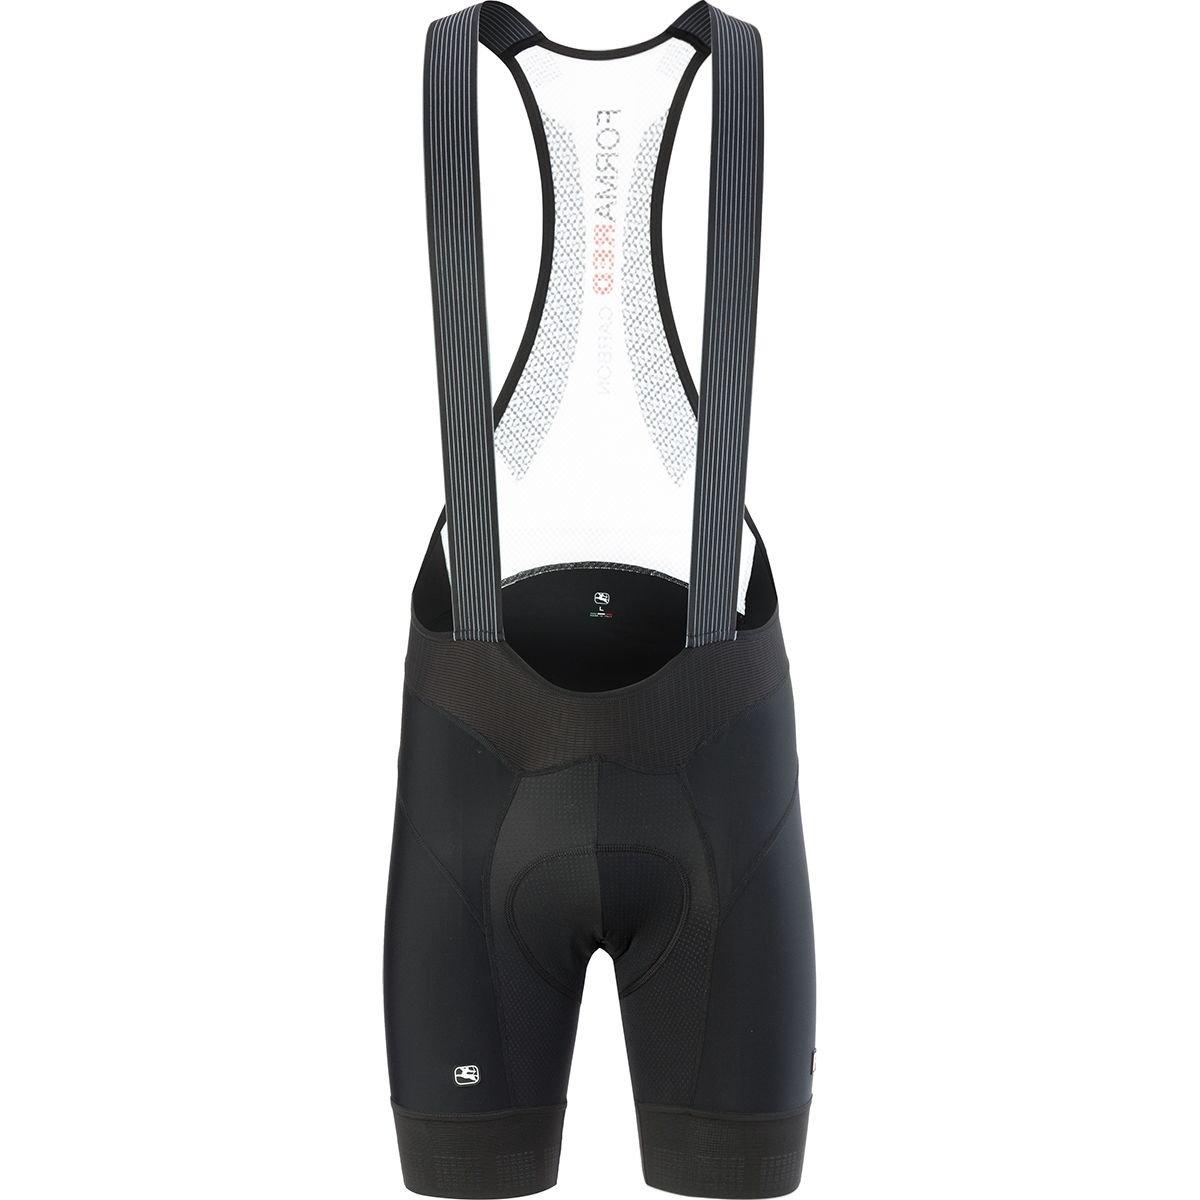 Giordana FR-C Pro Bib 5cm Shorter Short - Men's Black, S